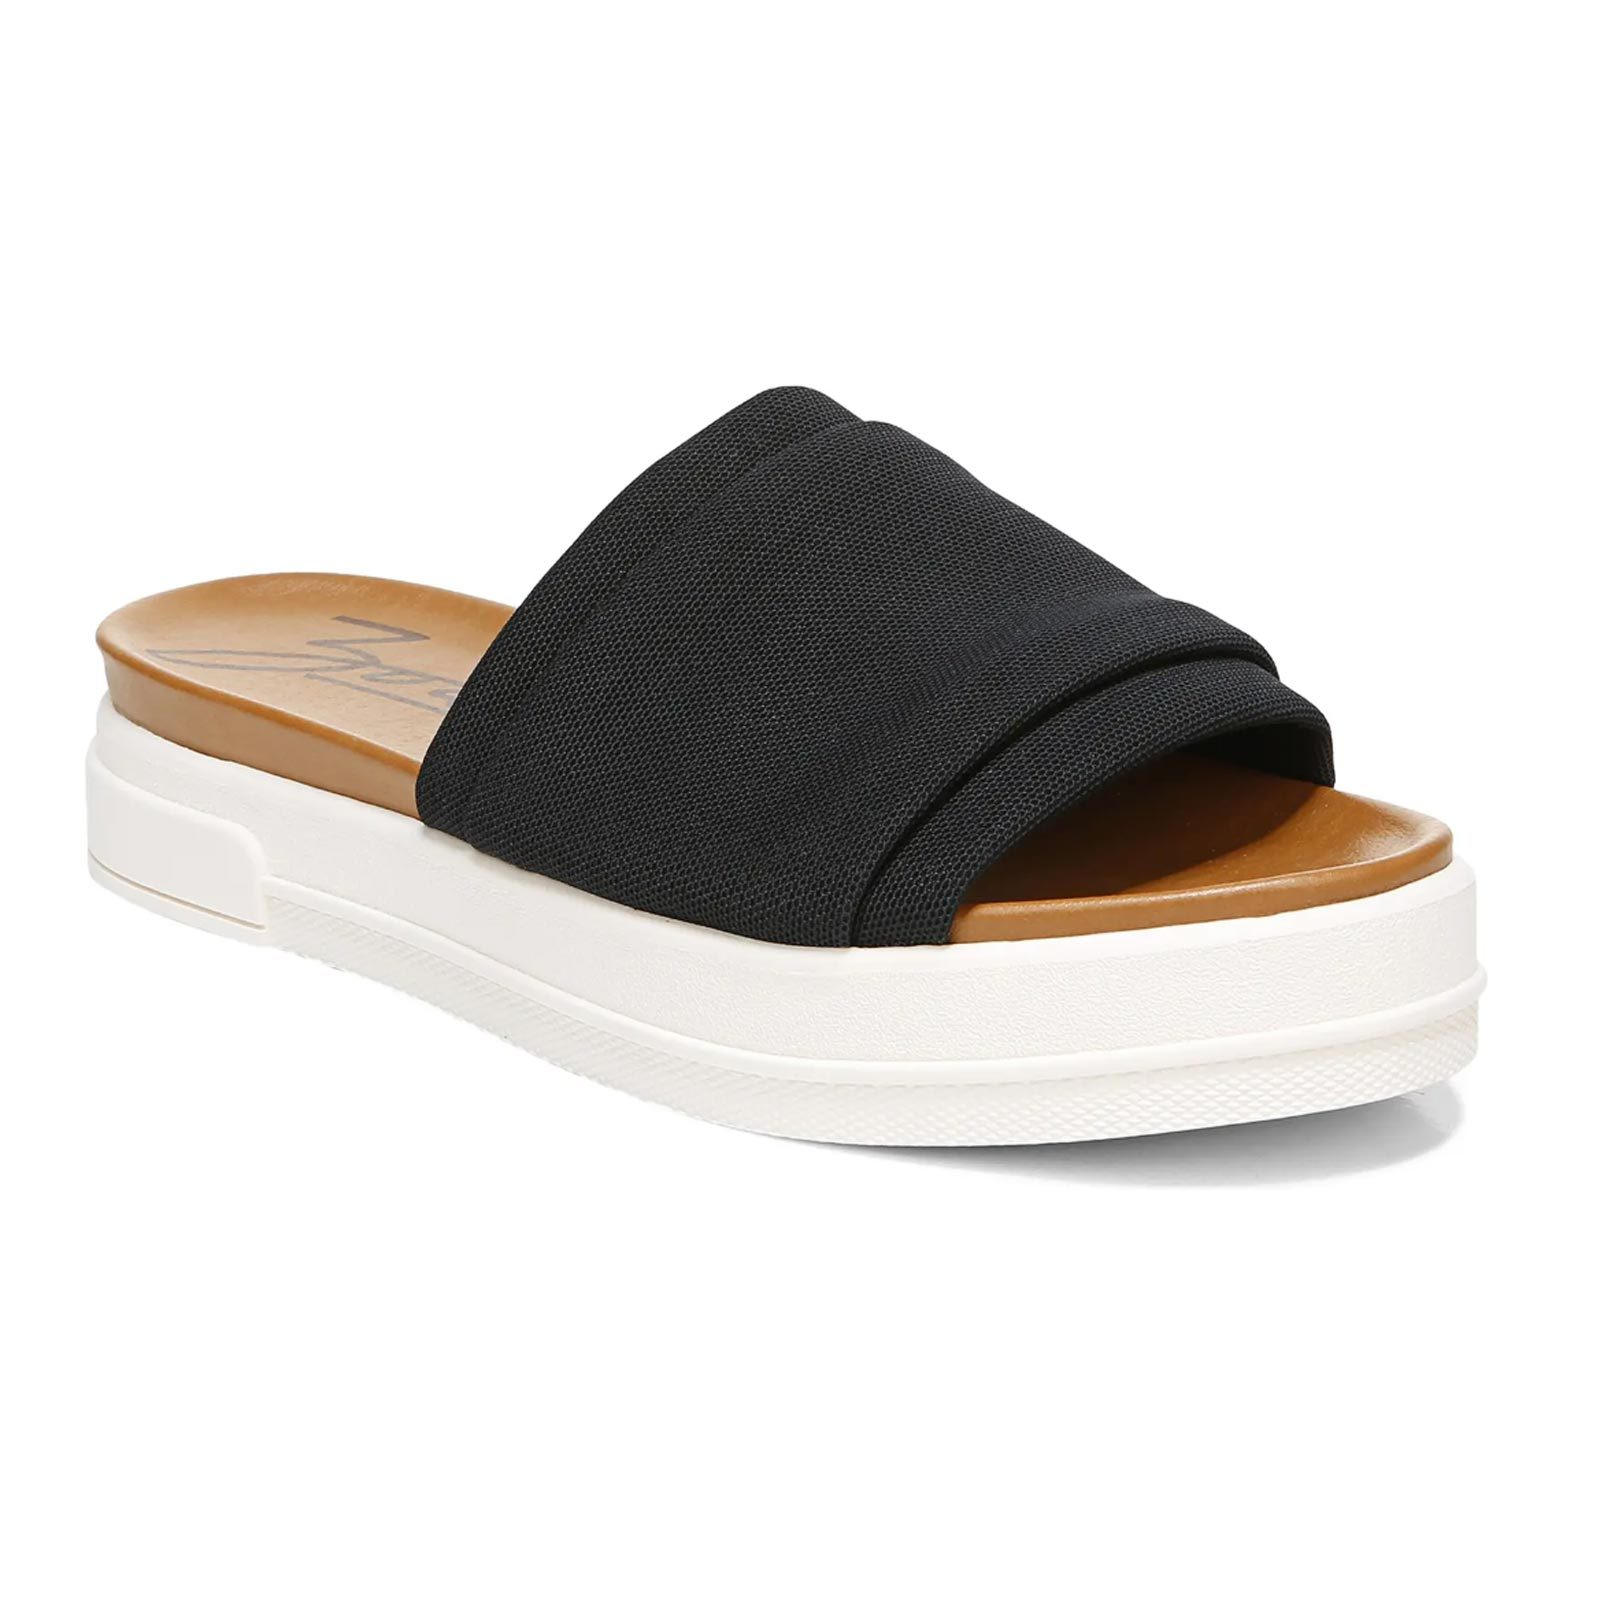 Zodiac Jolie Slide Sandals